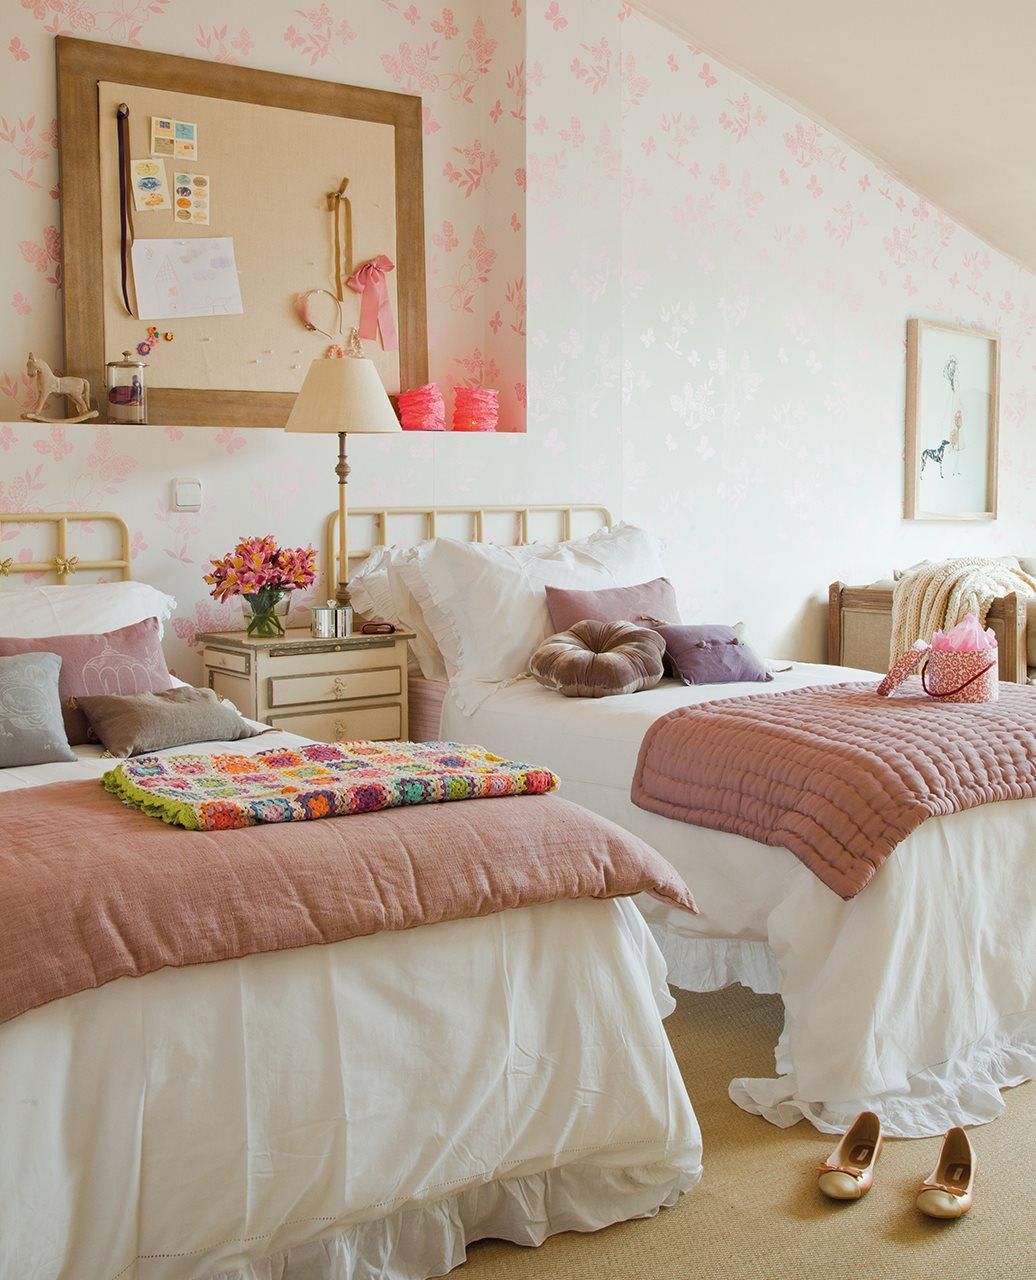 Dormitorio juvenil con dos camas cuartos con dos camas - Habitaciones de dos camas juveniles ...